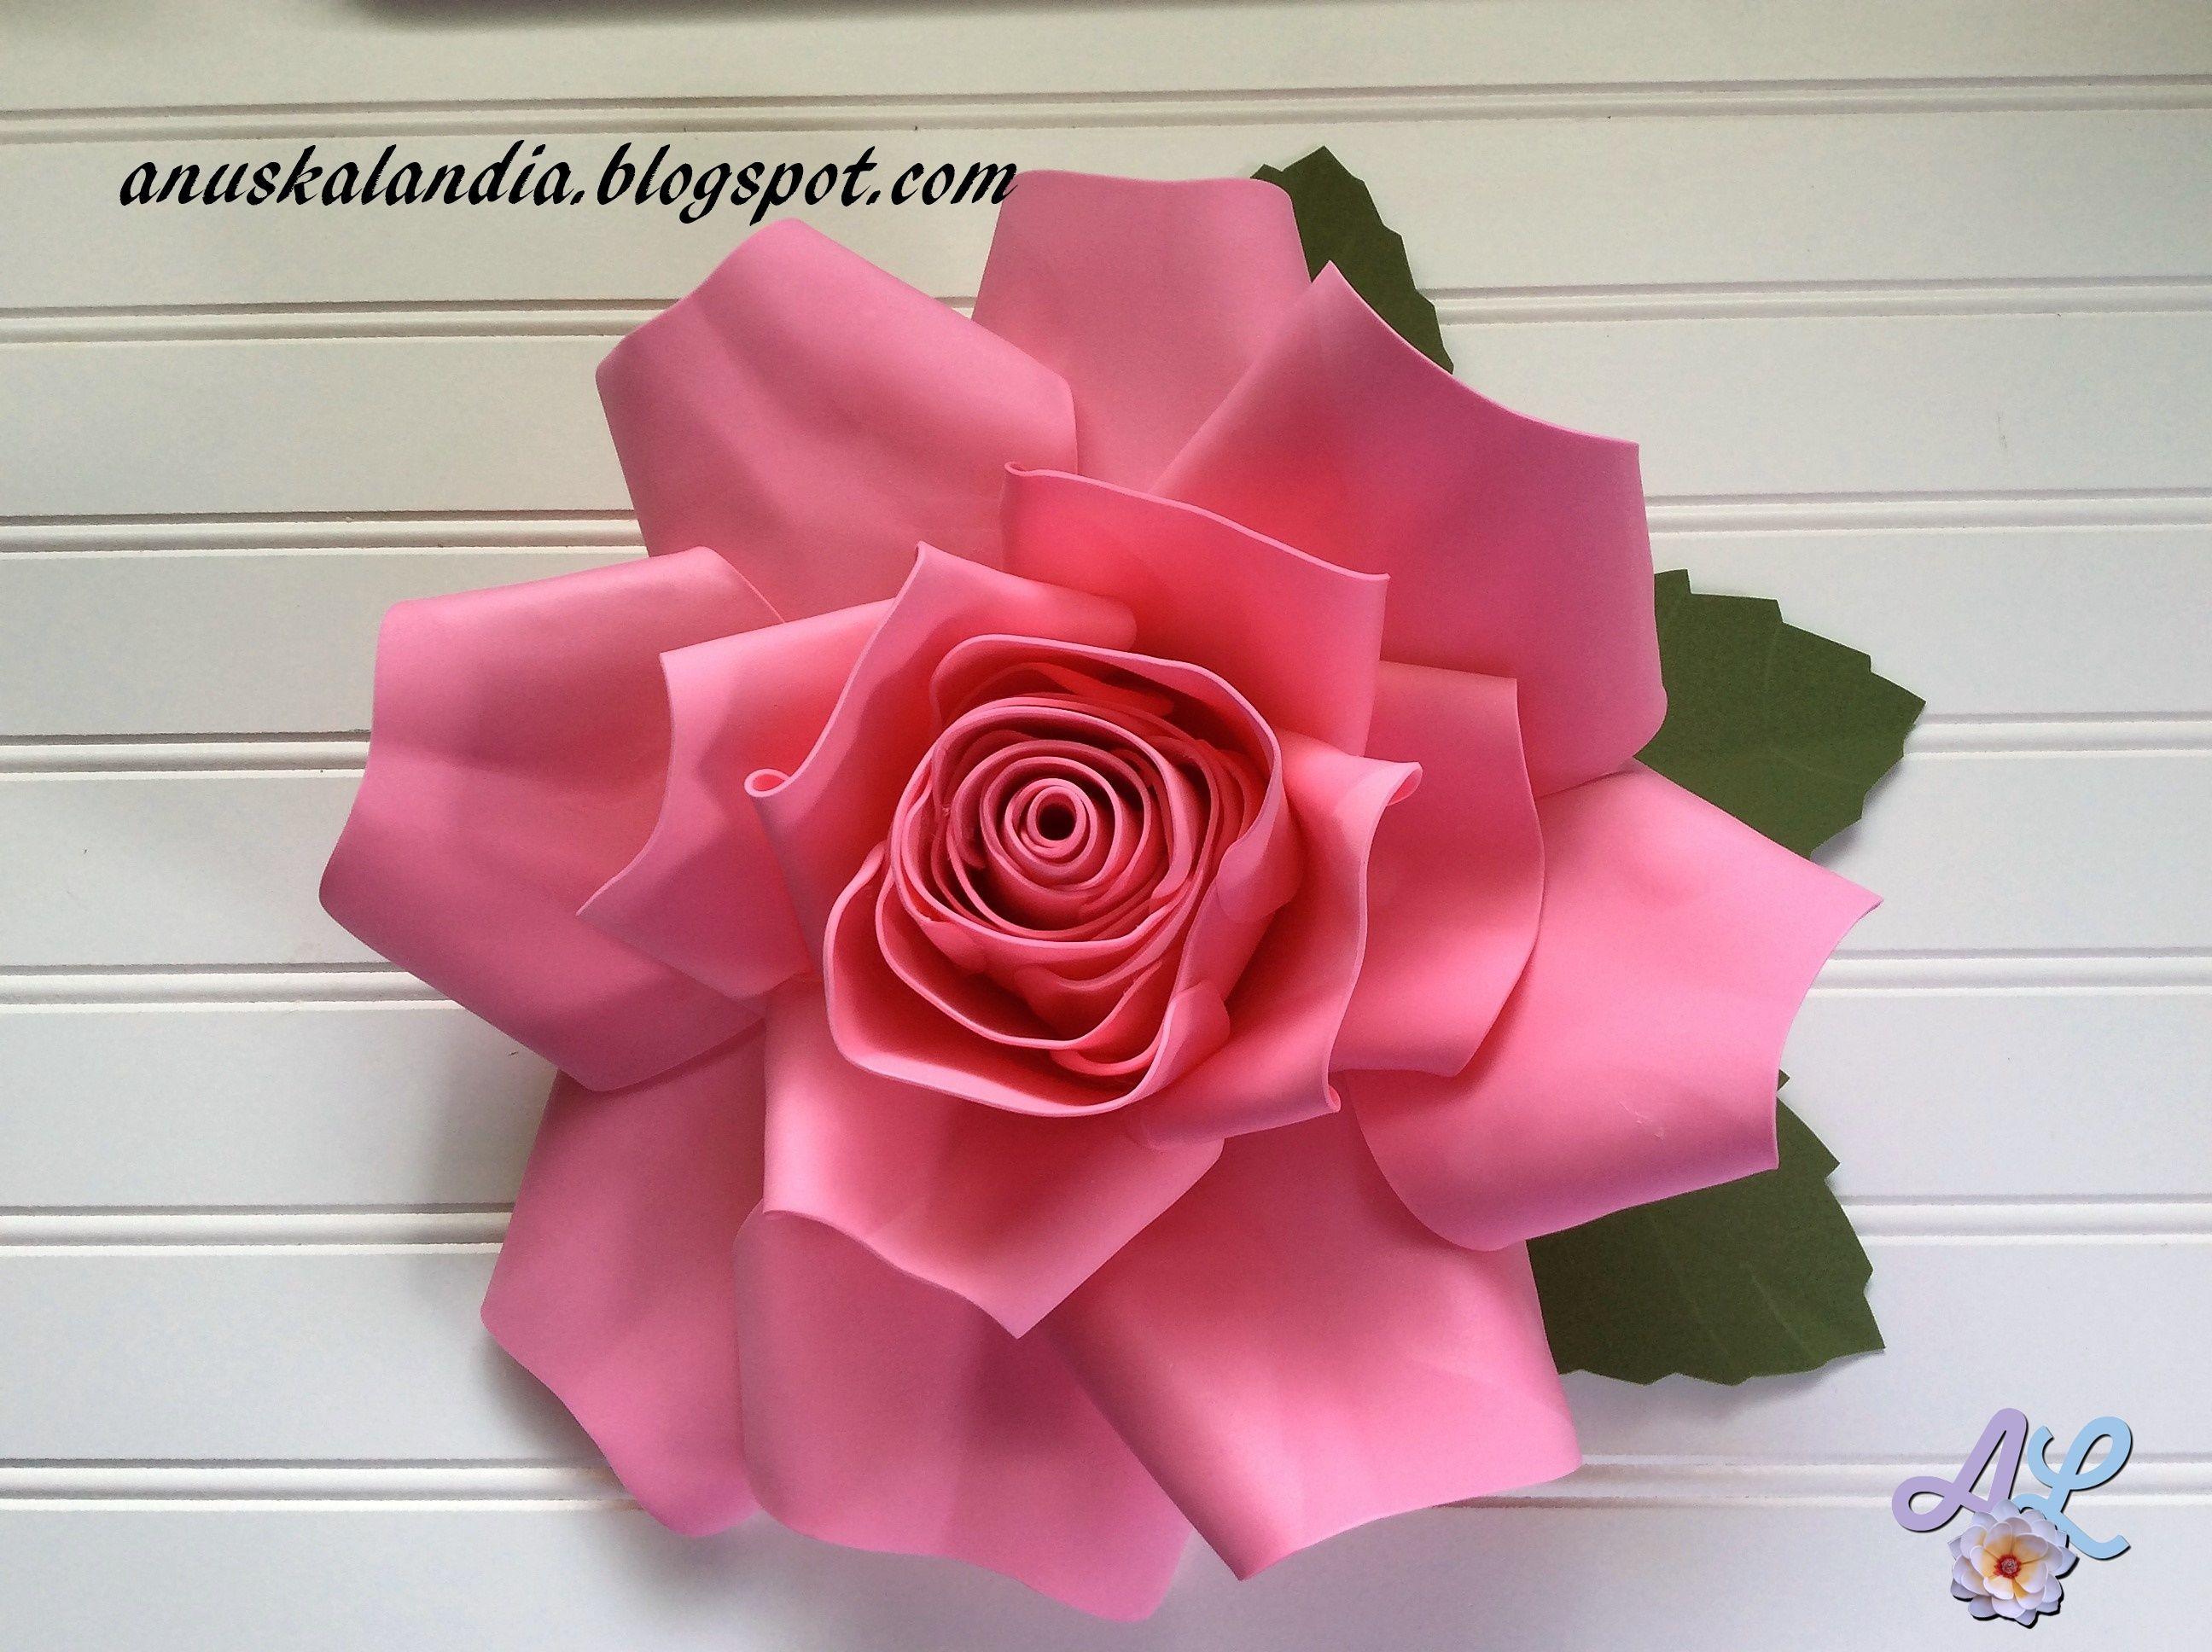 Rosa gigante goma eva o foamy | Goma eva, Rosas en goma eva, Rosa gigante